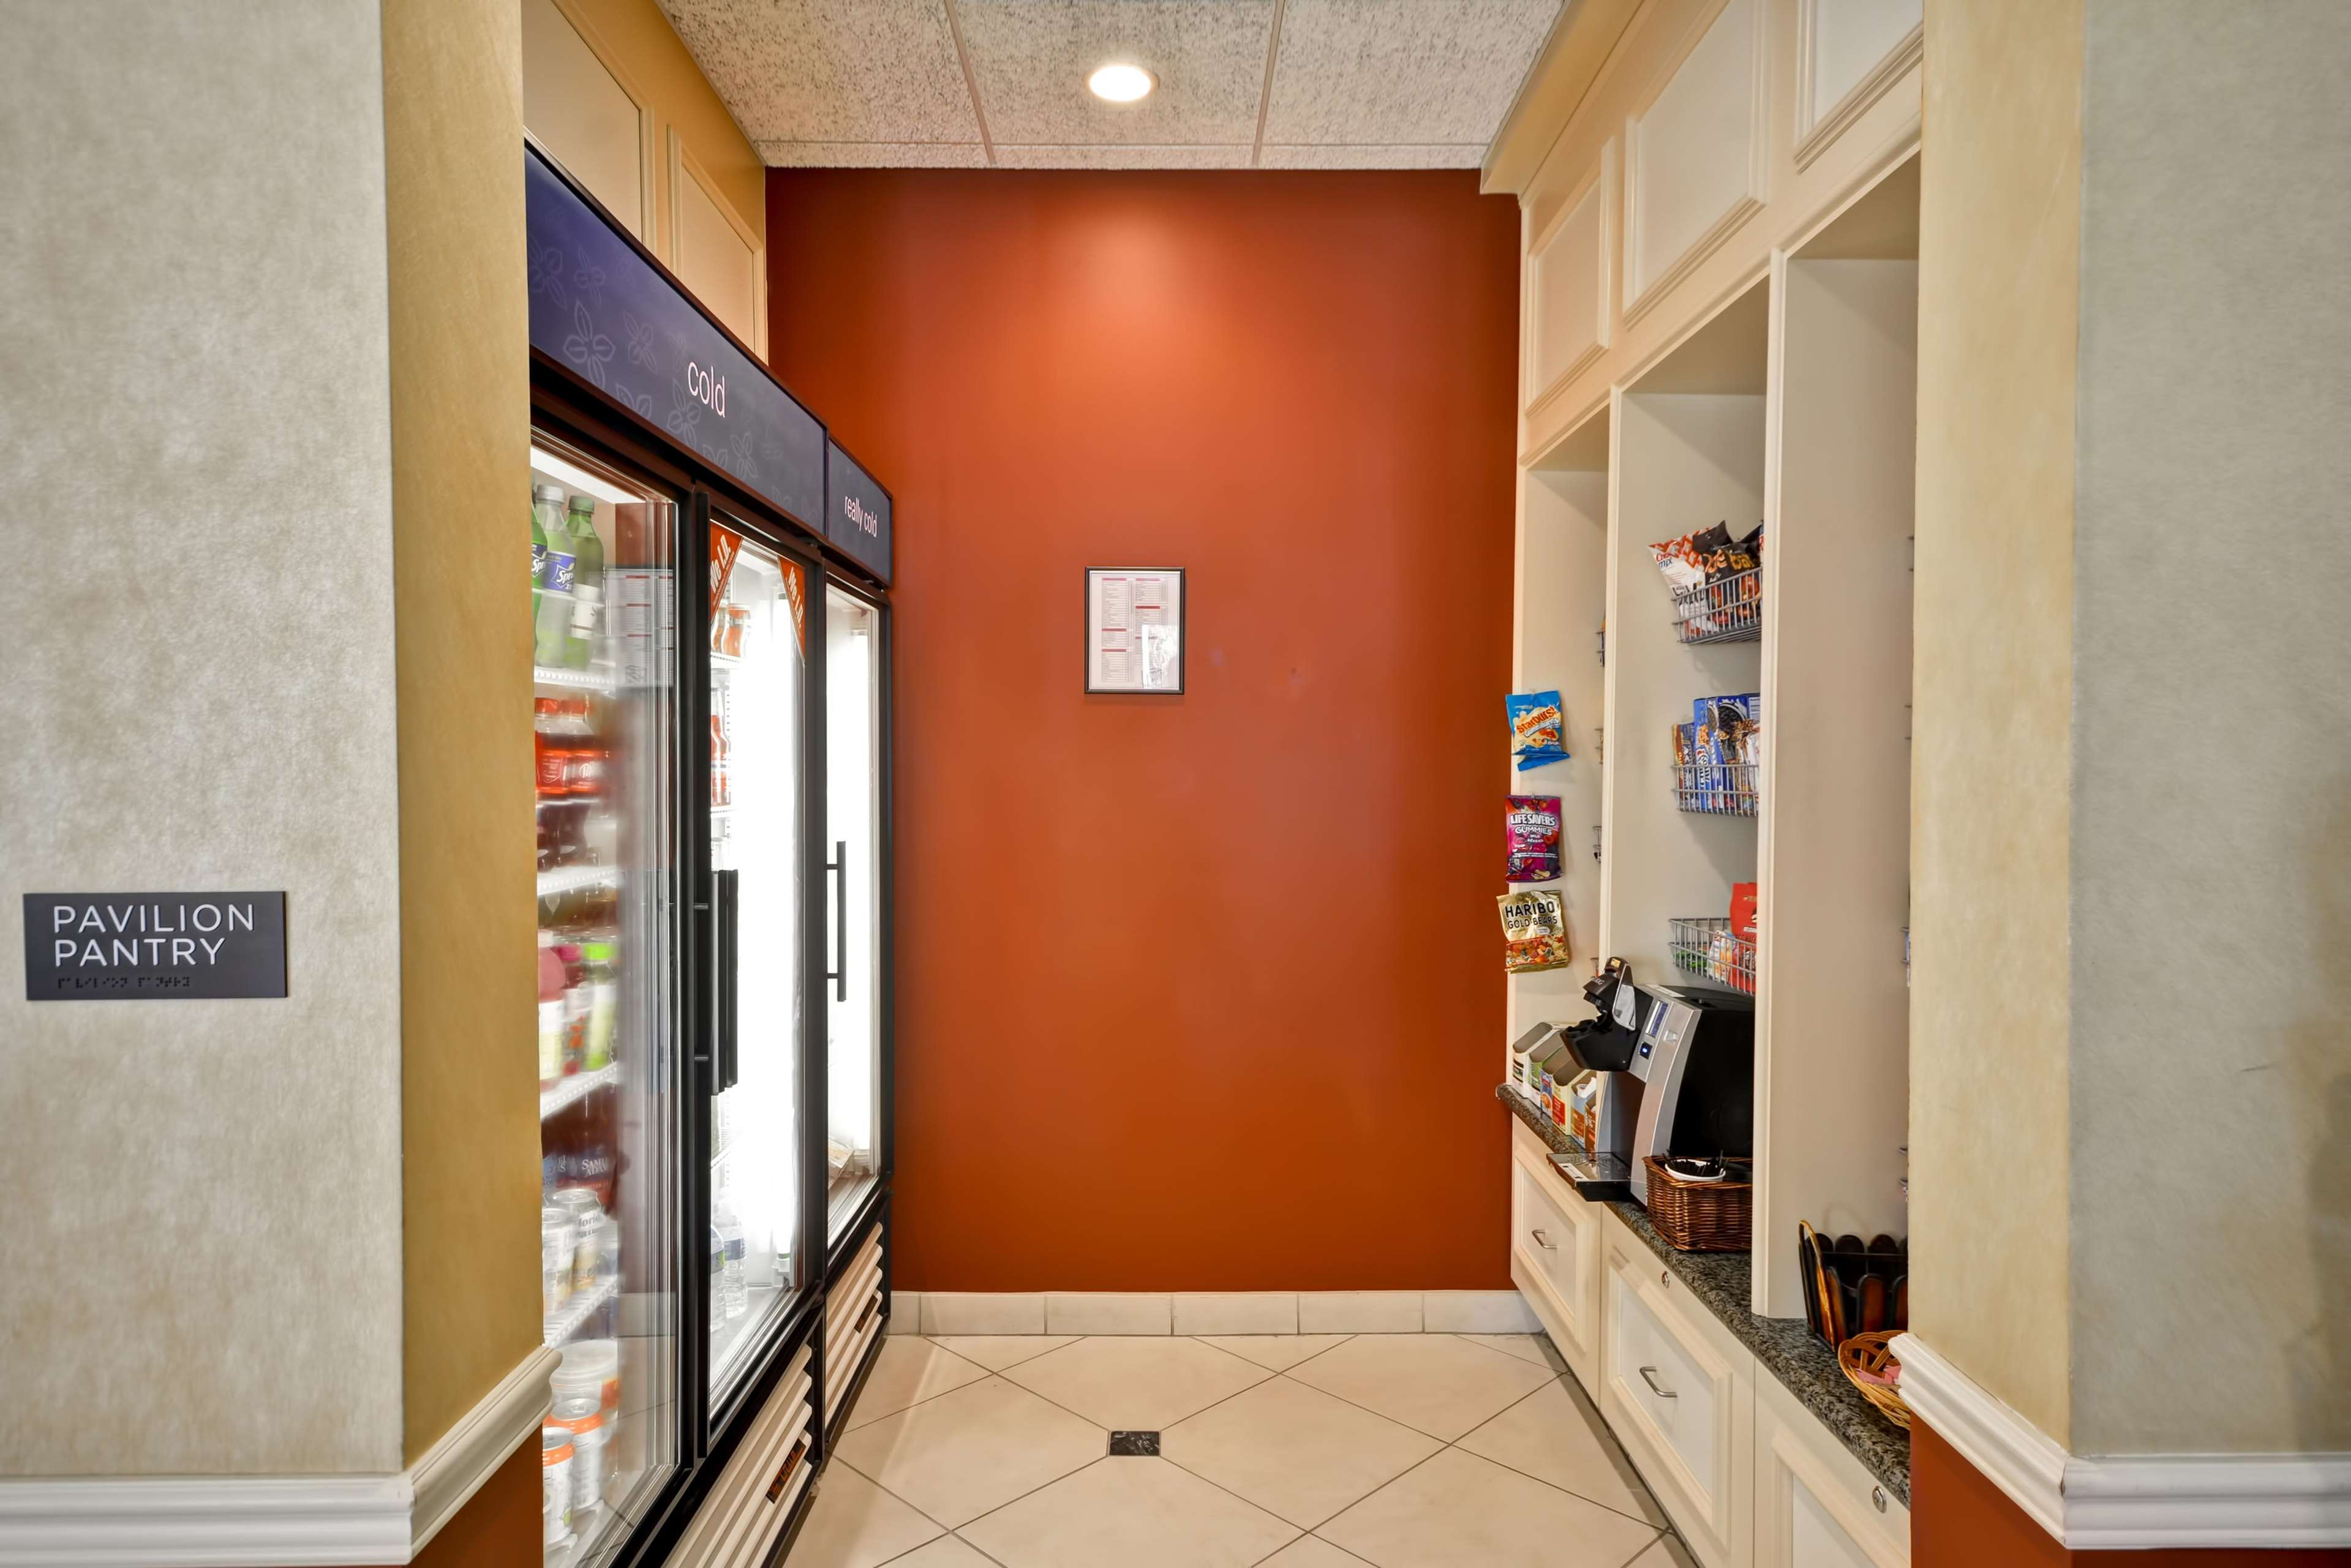 Hilton Garden Inn Tampa/Riverview/Brandon 4328 Garden Vista Drive Riverview,  FL Hotels U0026 Motels   MapQuest